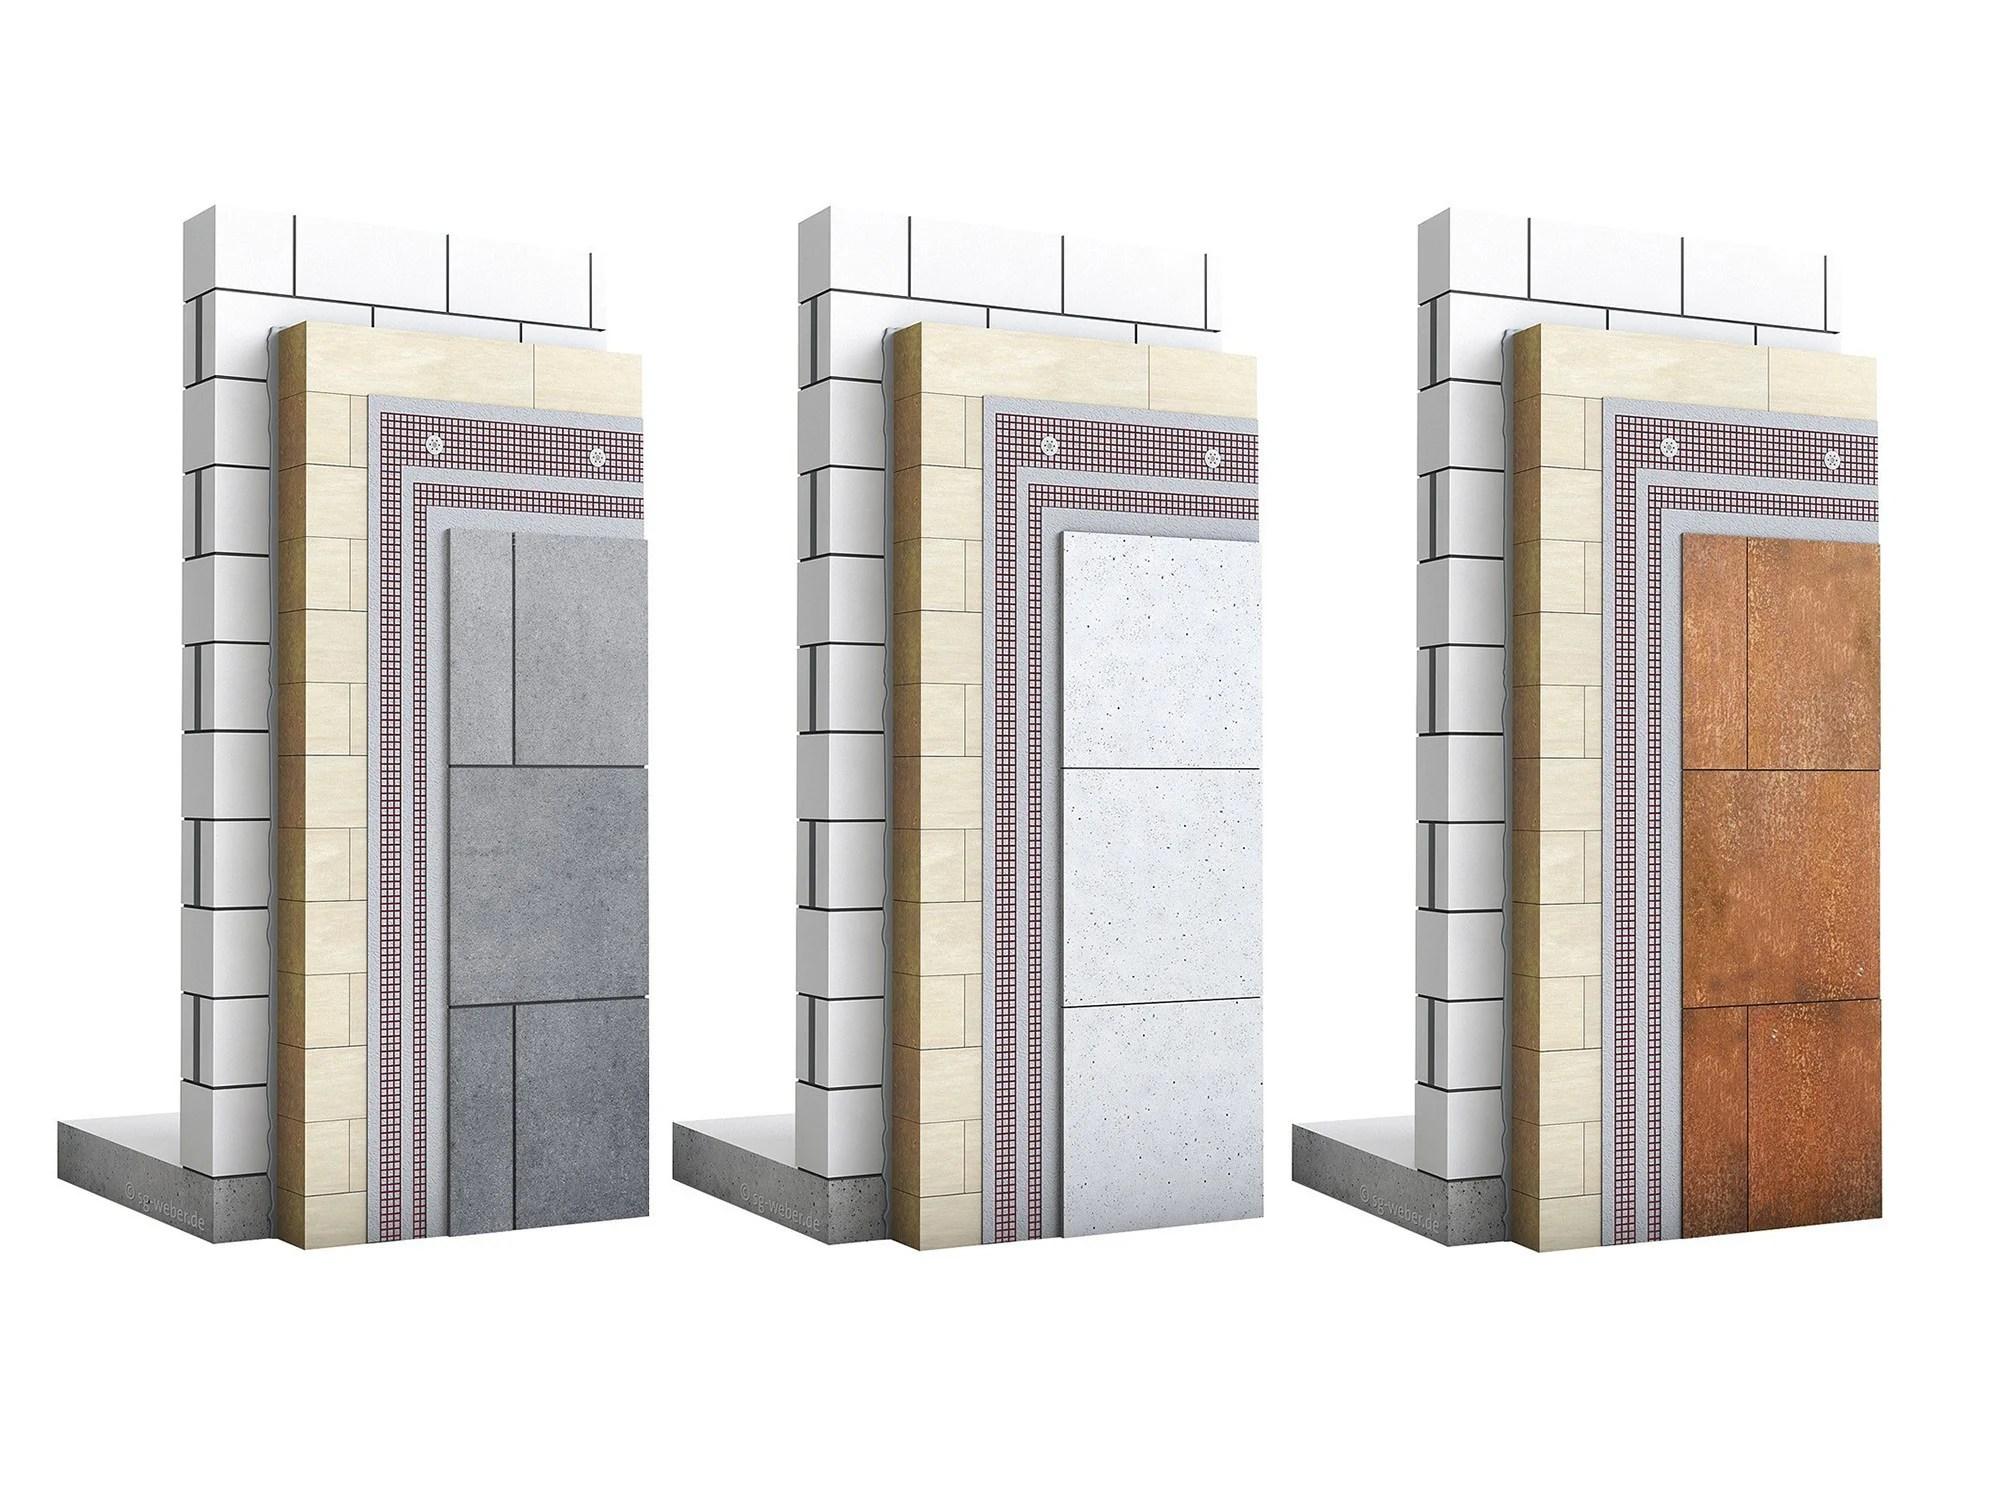 Cortenstahl Fassade Befestigung Fassaden Aus Feuerverzinktem Stahl